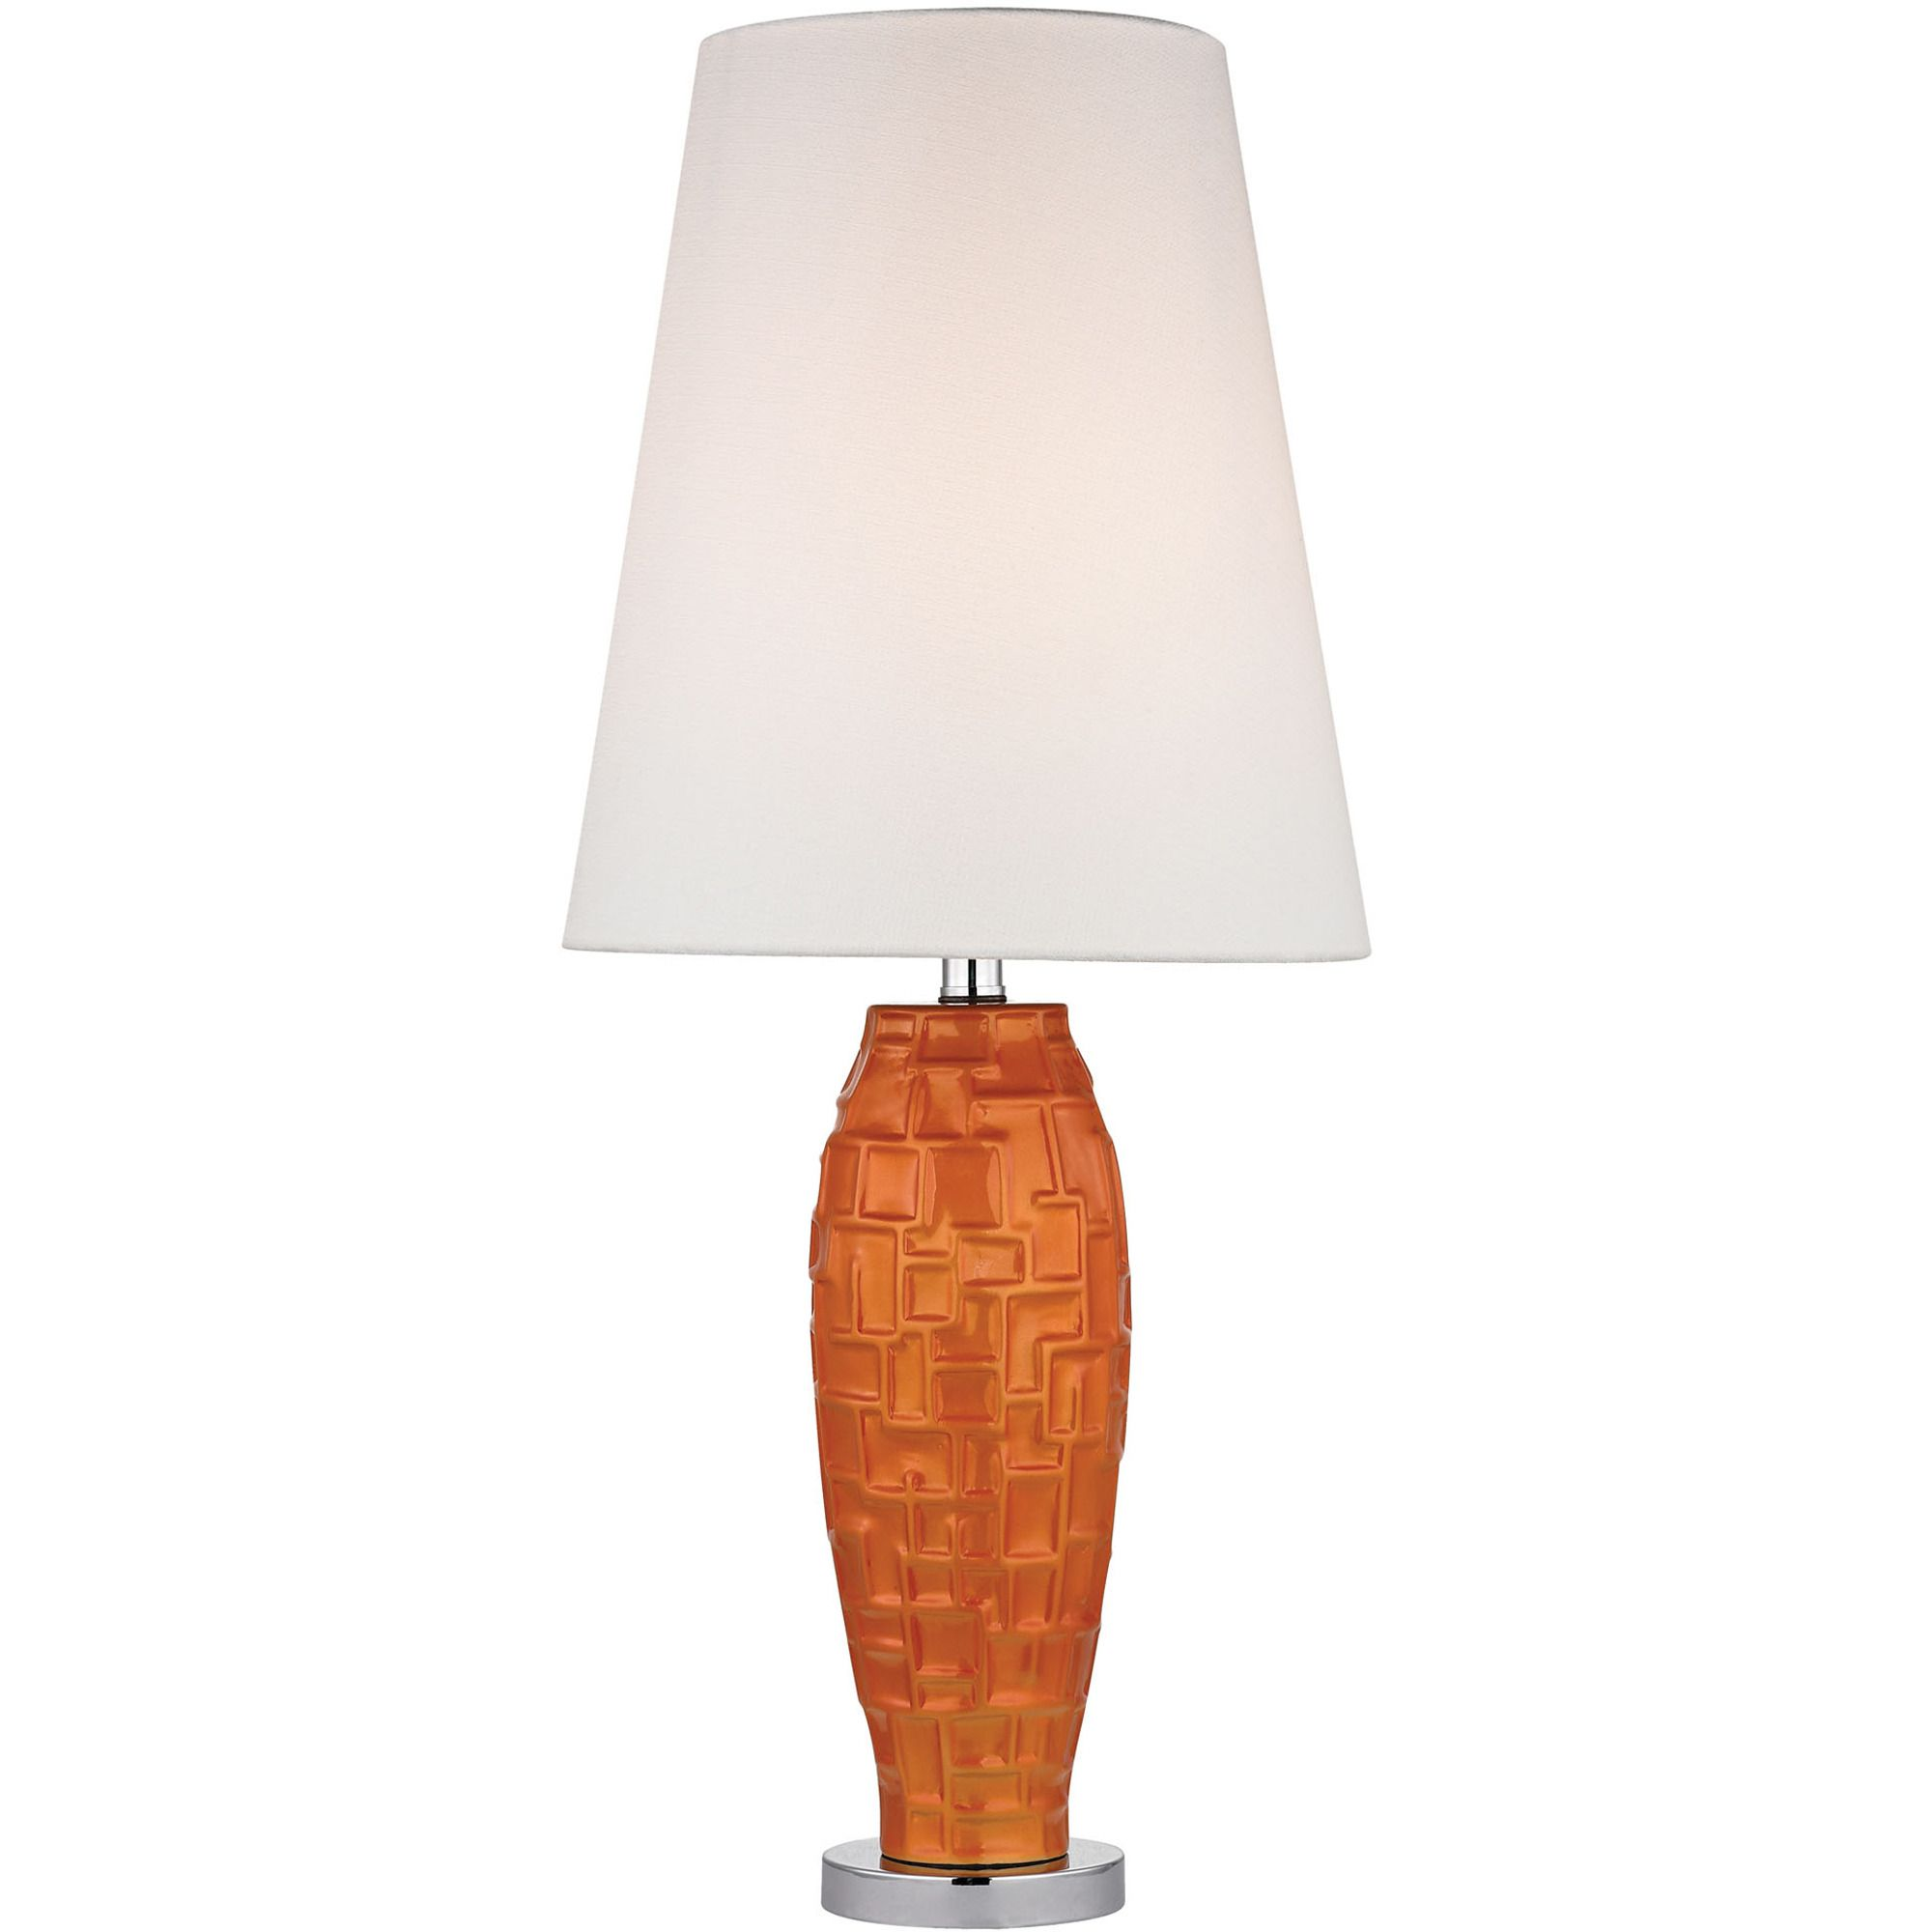 Hawick Ceramic Table Lamp In Tangerine Orange Dimond Lighting Home Gallery Stores Orange Table Lamps Table Lamp Led Table Lamp #orange #table #lamps #for #living #room